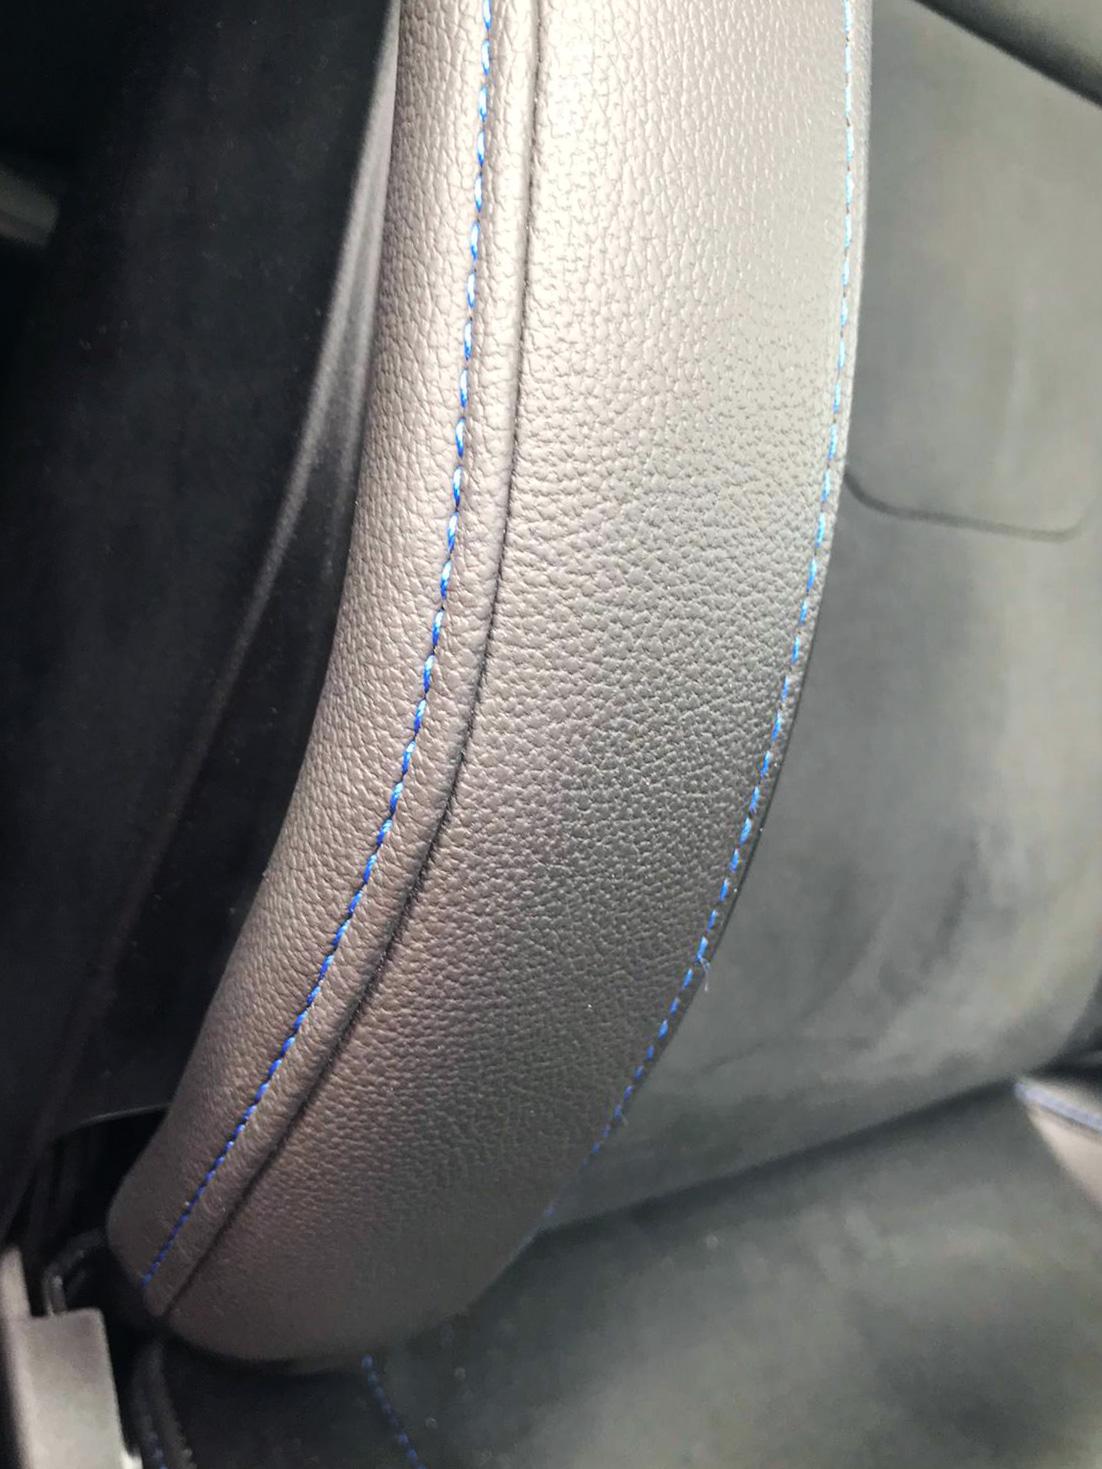 Car+seat+repair+stitching+detail+after+cigarette+burn